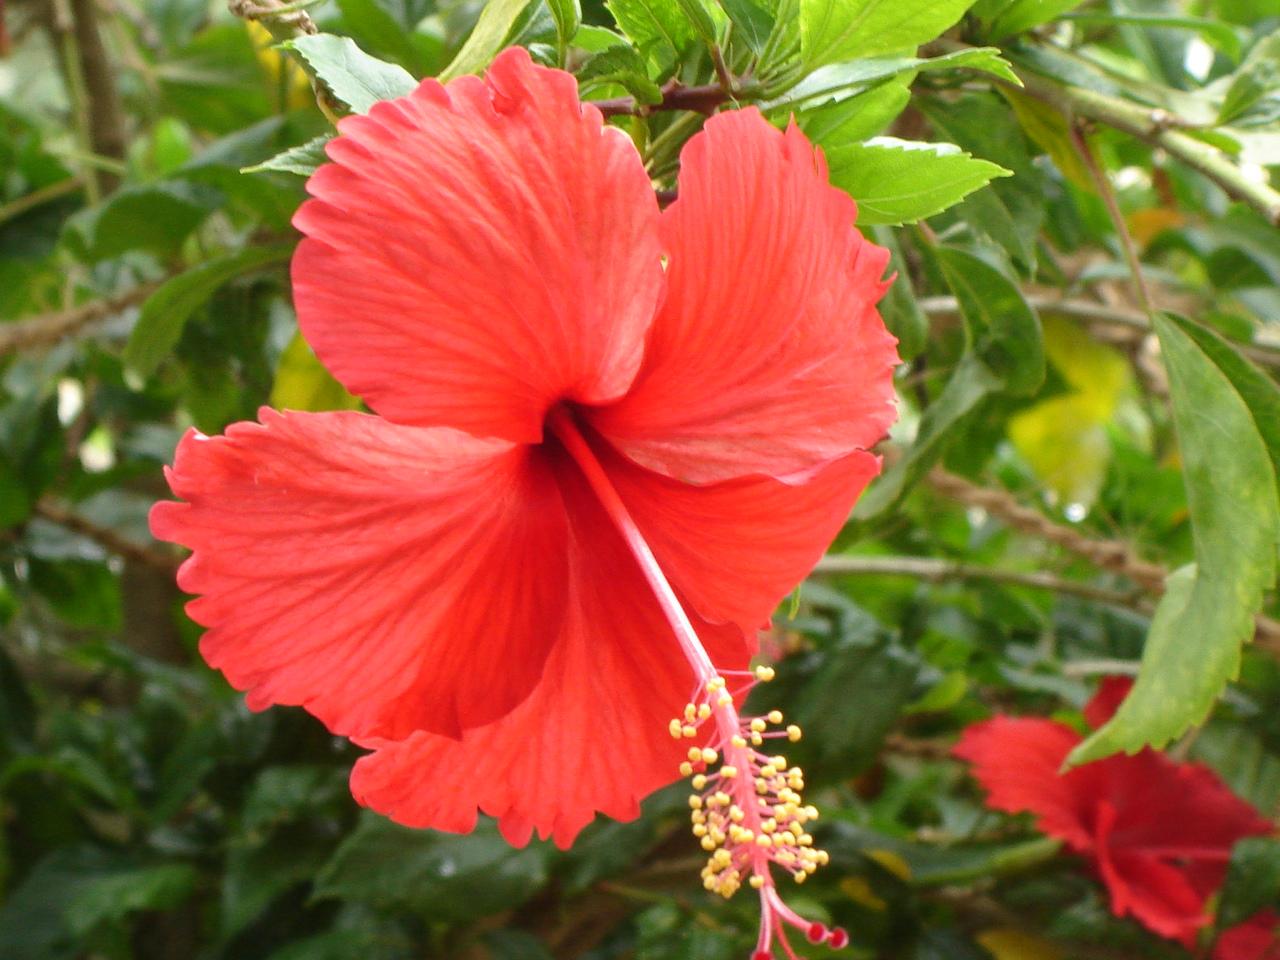 Jamaica hibiscus flowers images flower wallpaper hd jamaica hibiscus flowers images flower wallpaper hd hibiscus flower jamaica images flower wallpaper hd agua fresca izmirmasajfo